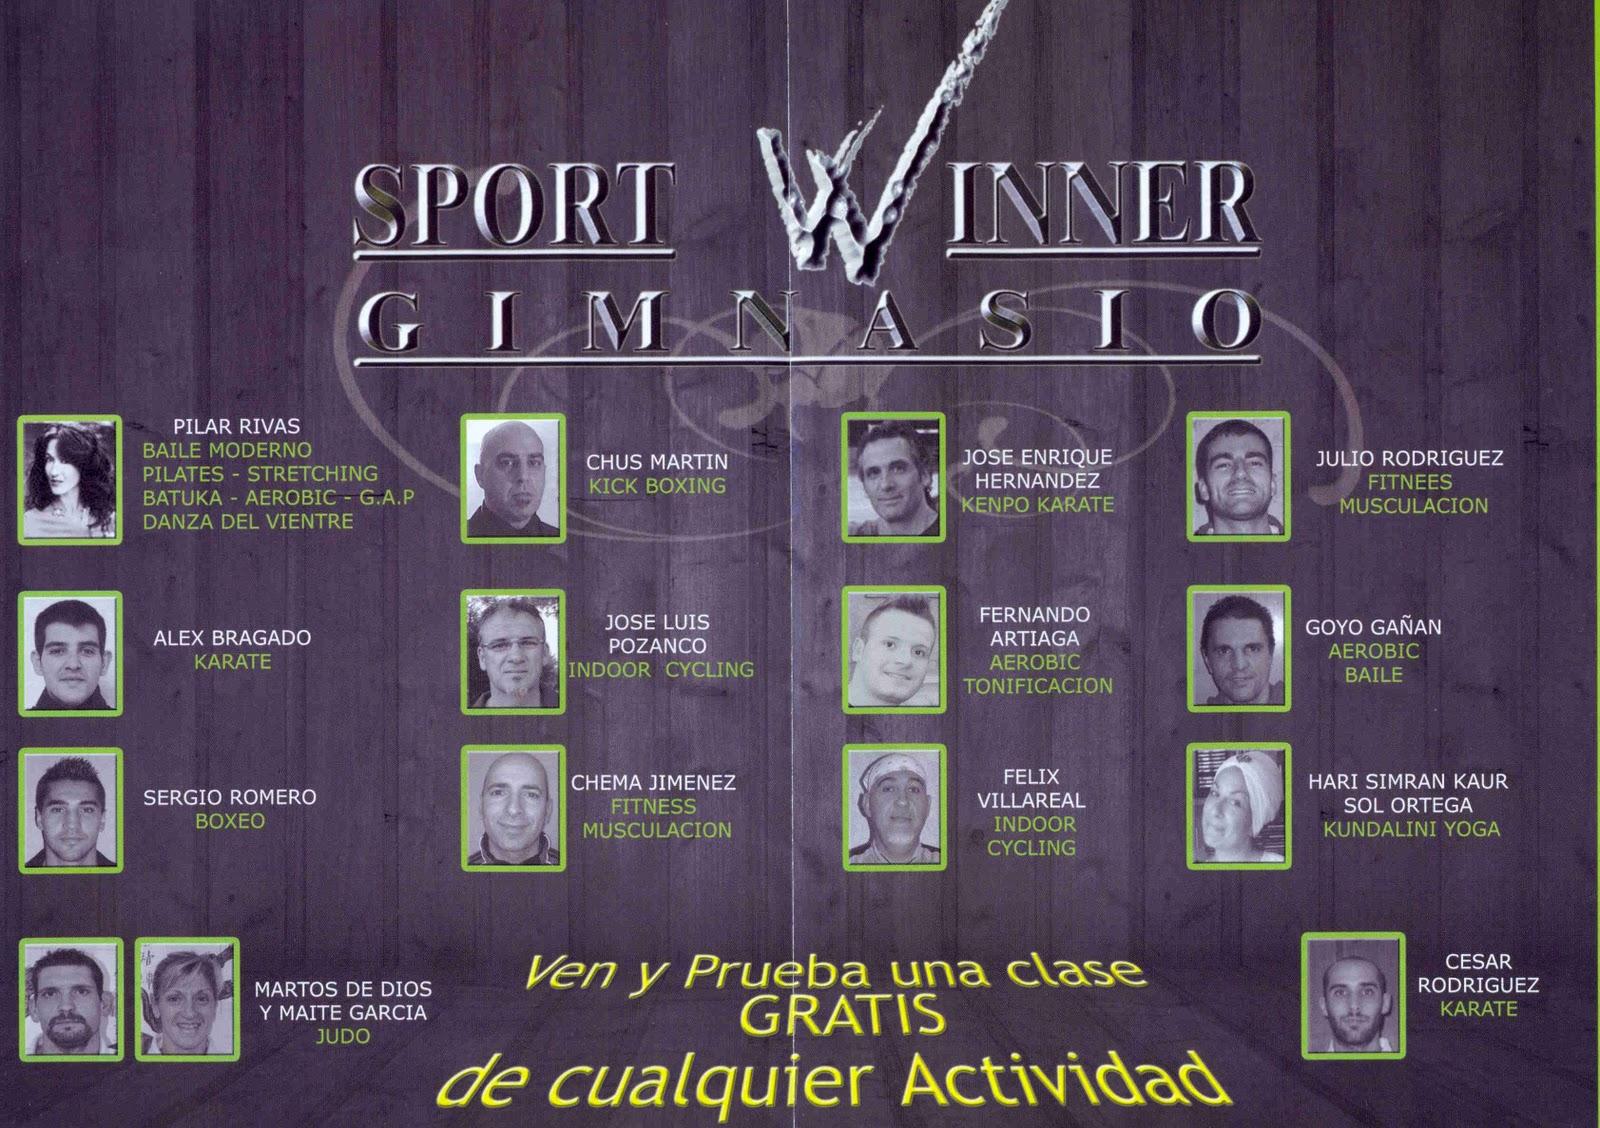 Judokasjushirokan gimnasio sport winner tu centro for Gimnasio winner